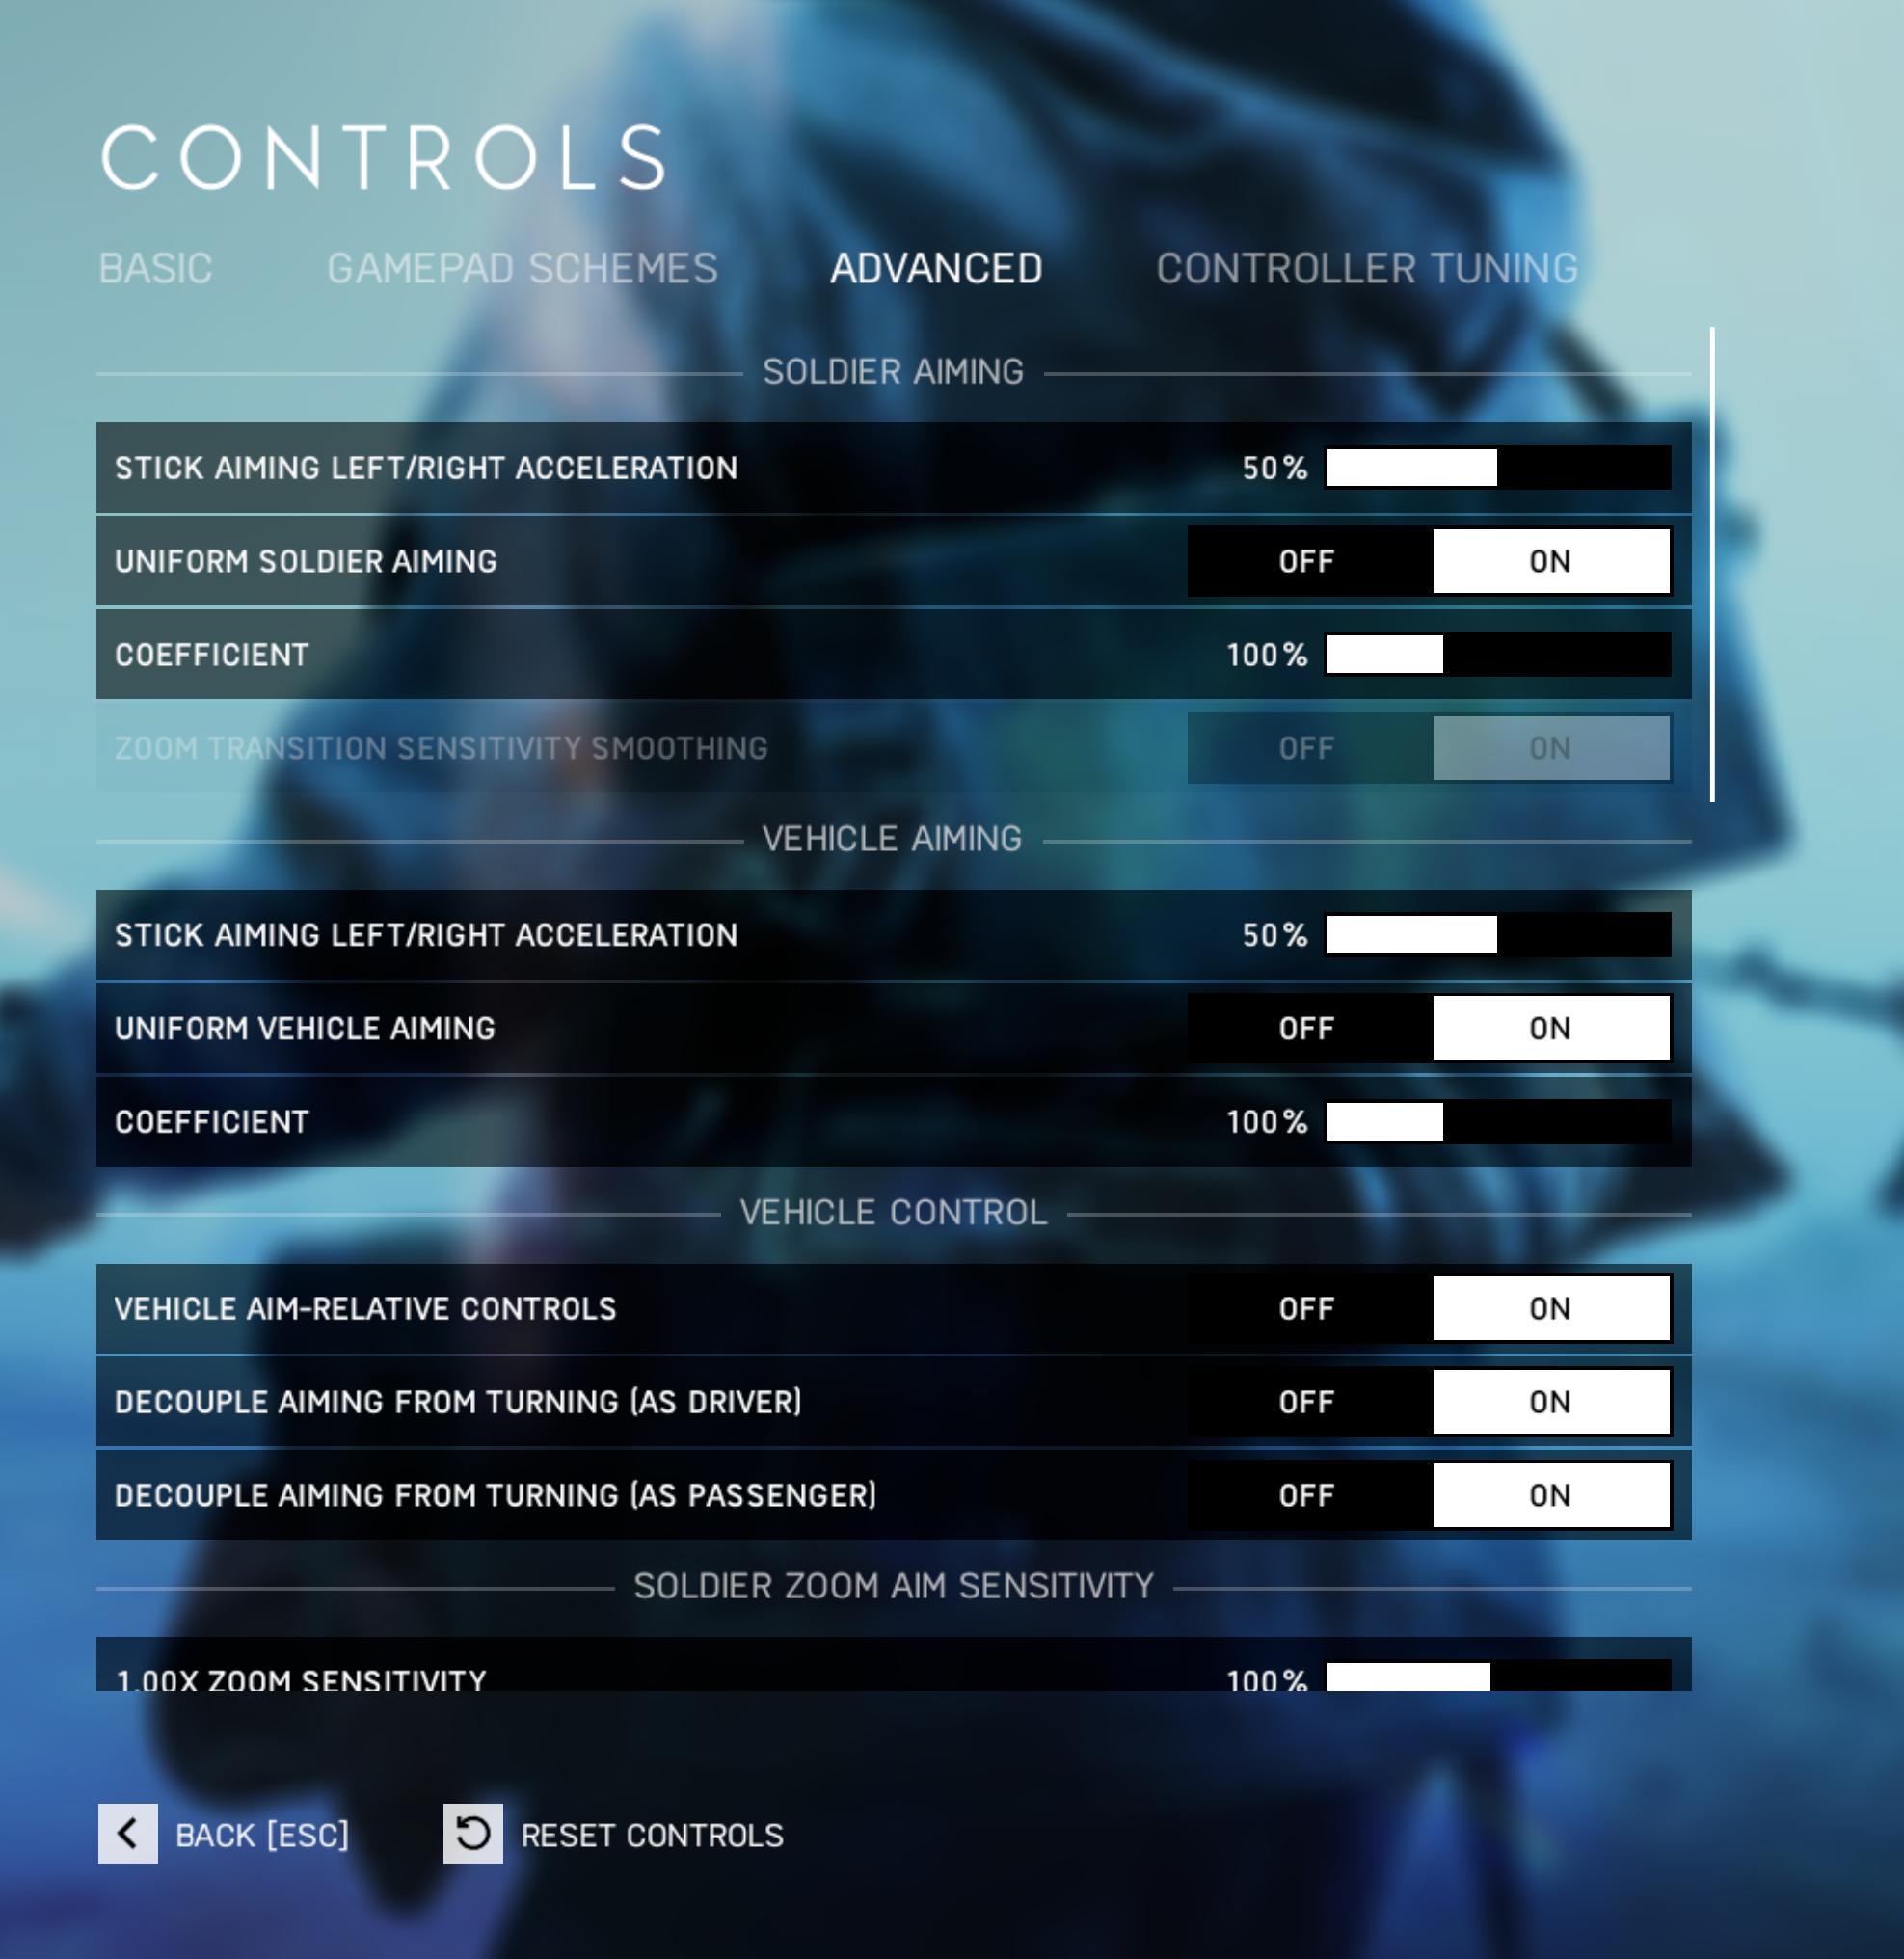 Battlefield V Tips, Part II: Settings - Answer HQ